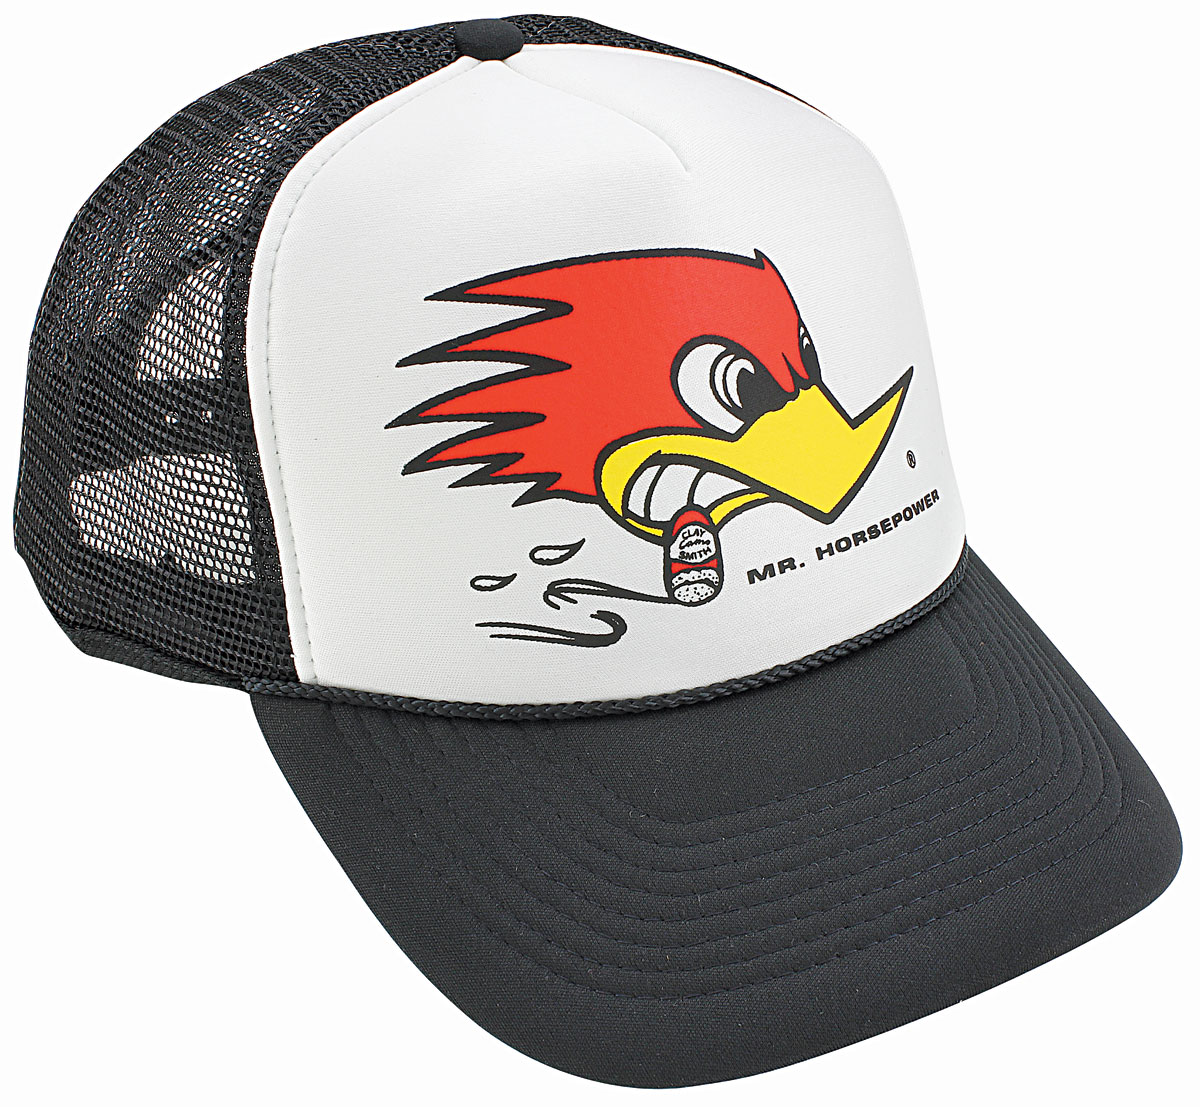 Hat, Trucker, Clay Smith, Mesh, Black